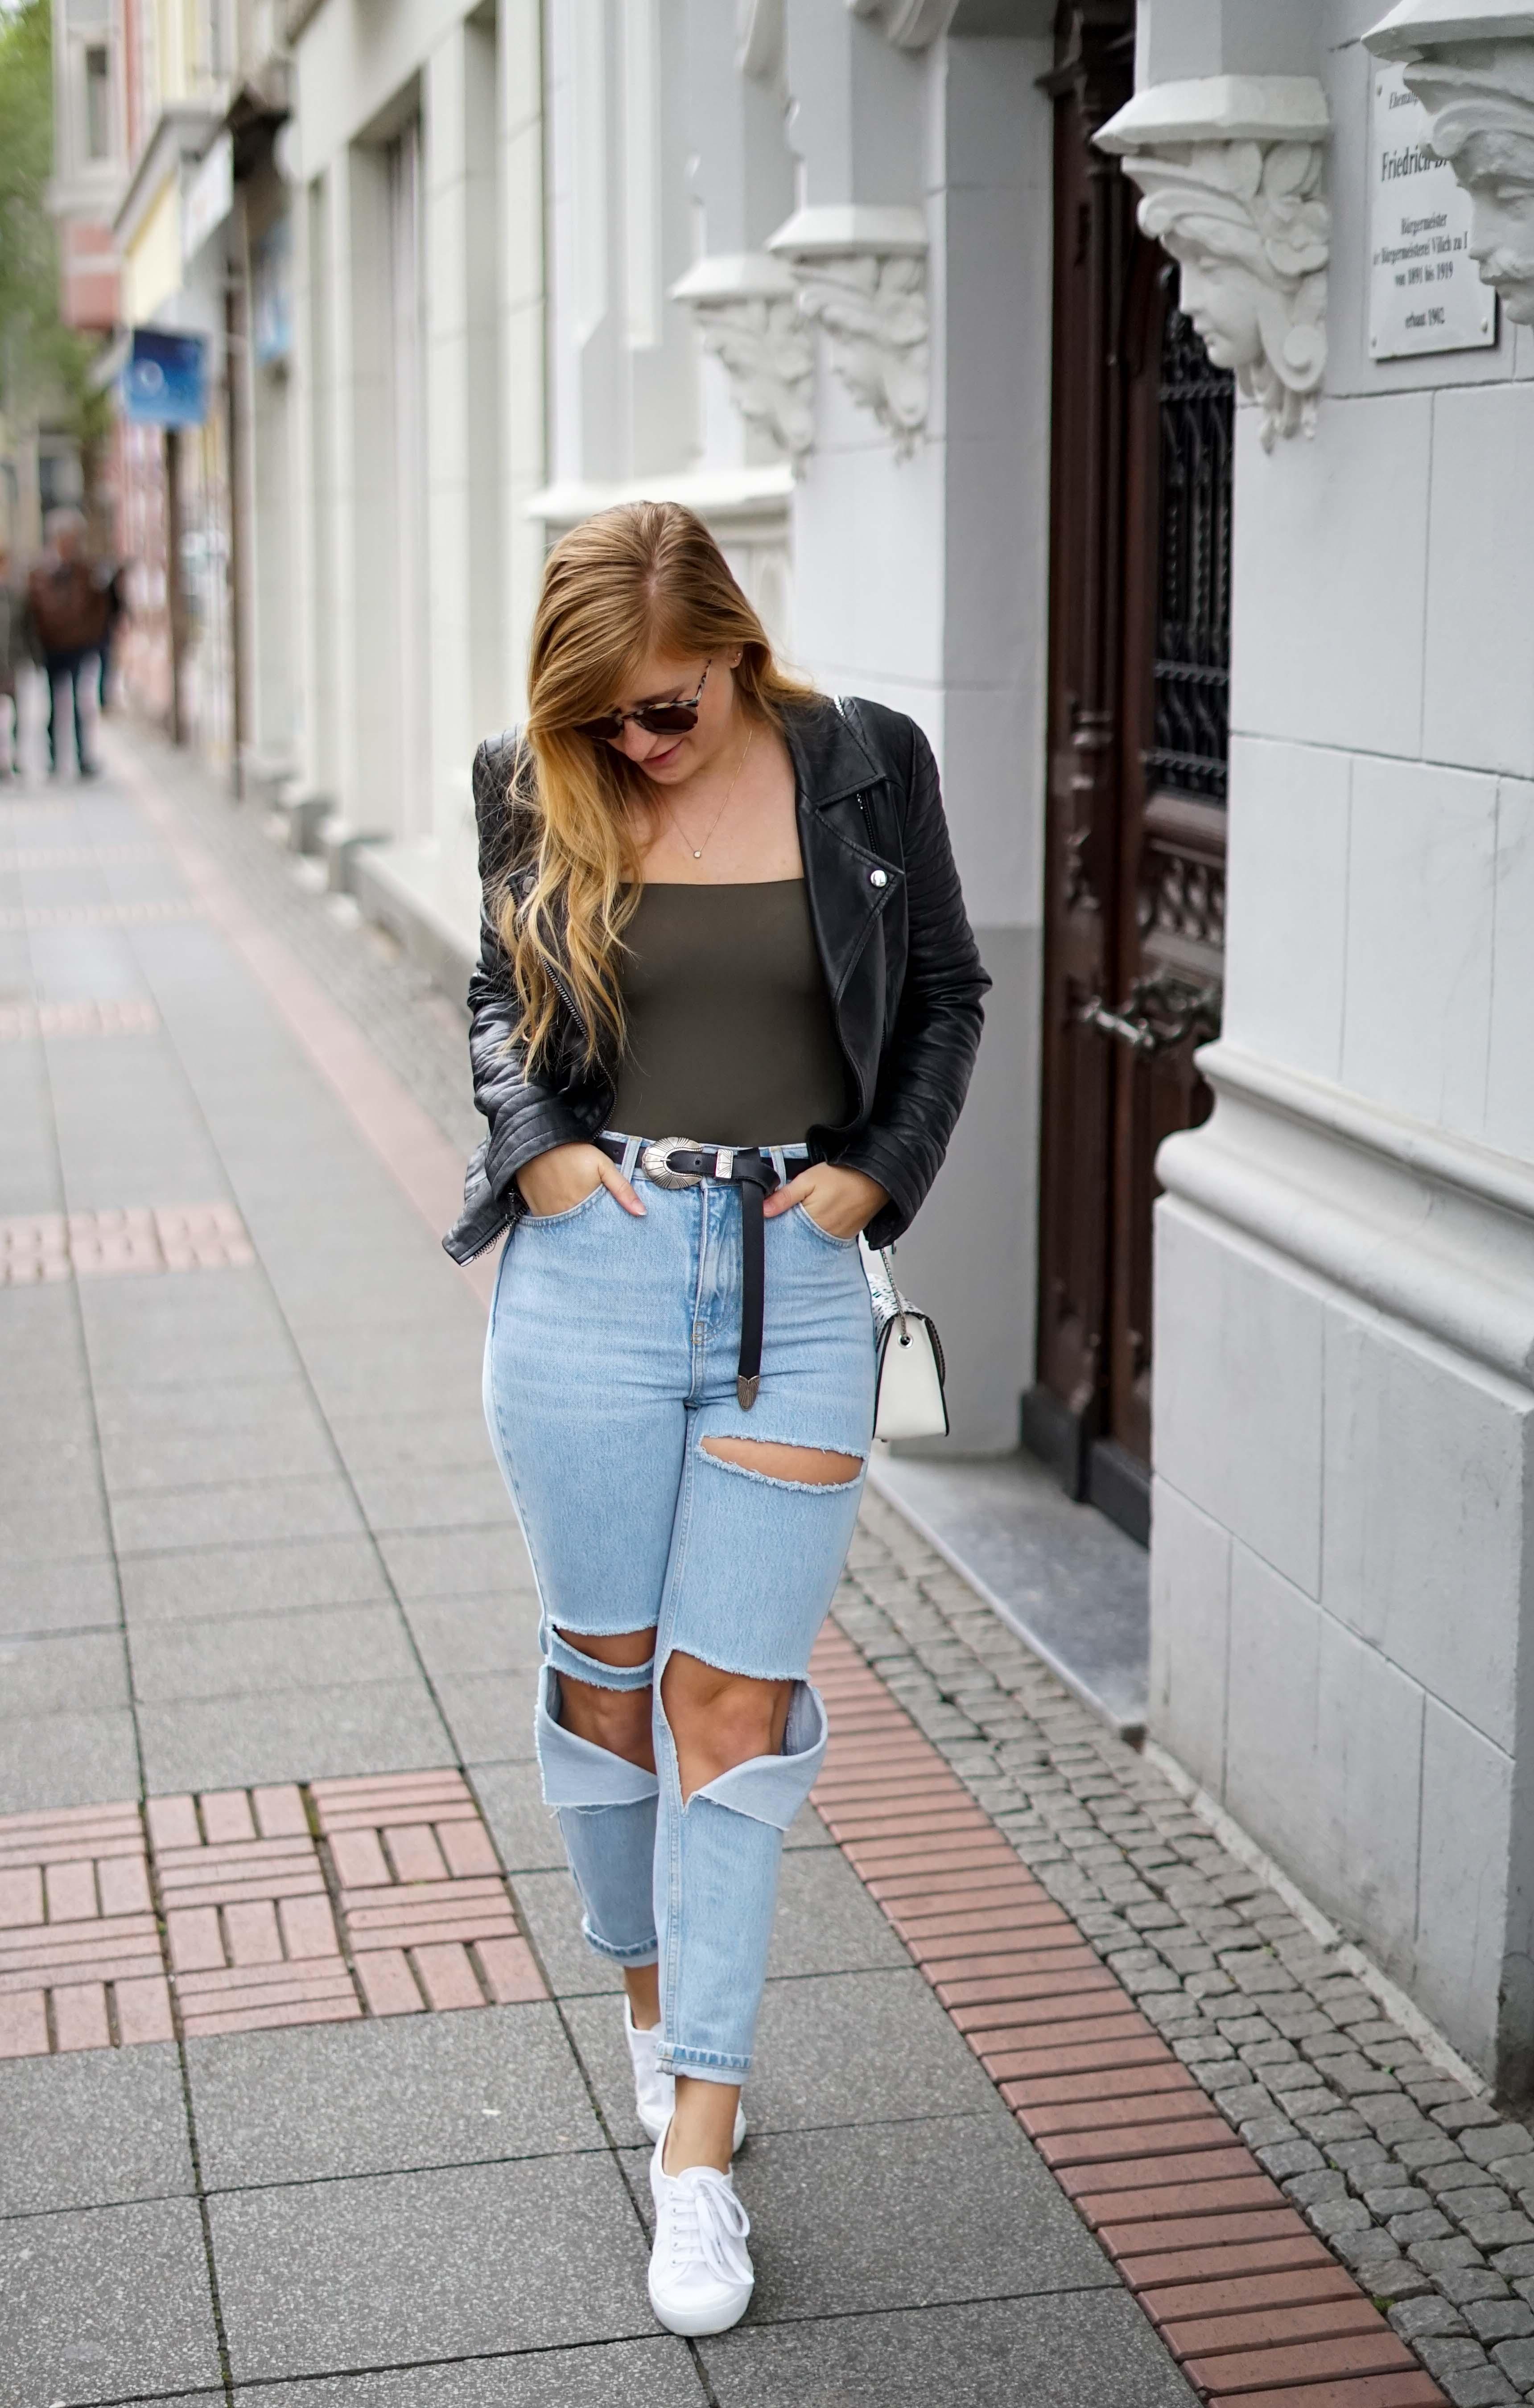 Herbstmode 2019 Herbstoutfit Lederjacke Ripped Jeans Modeblog Bonn 3